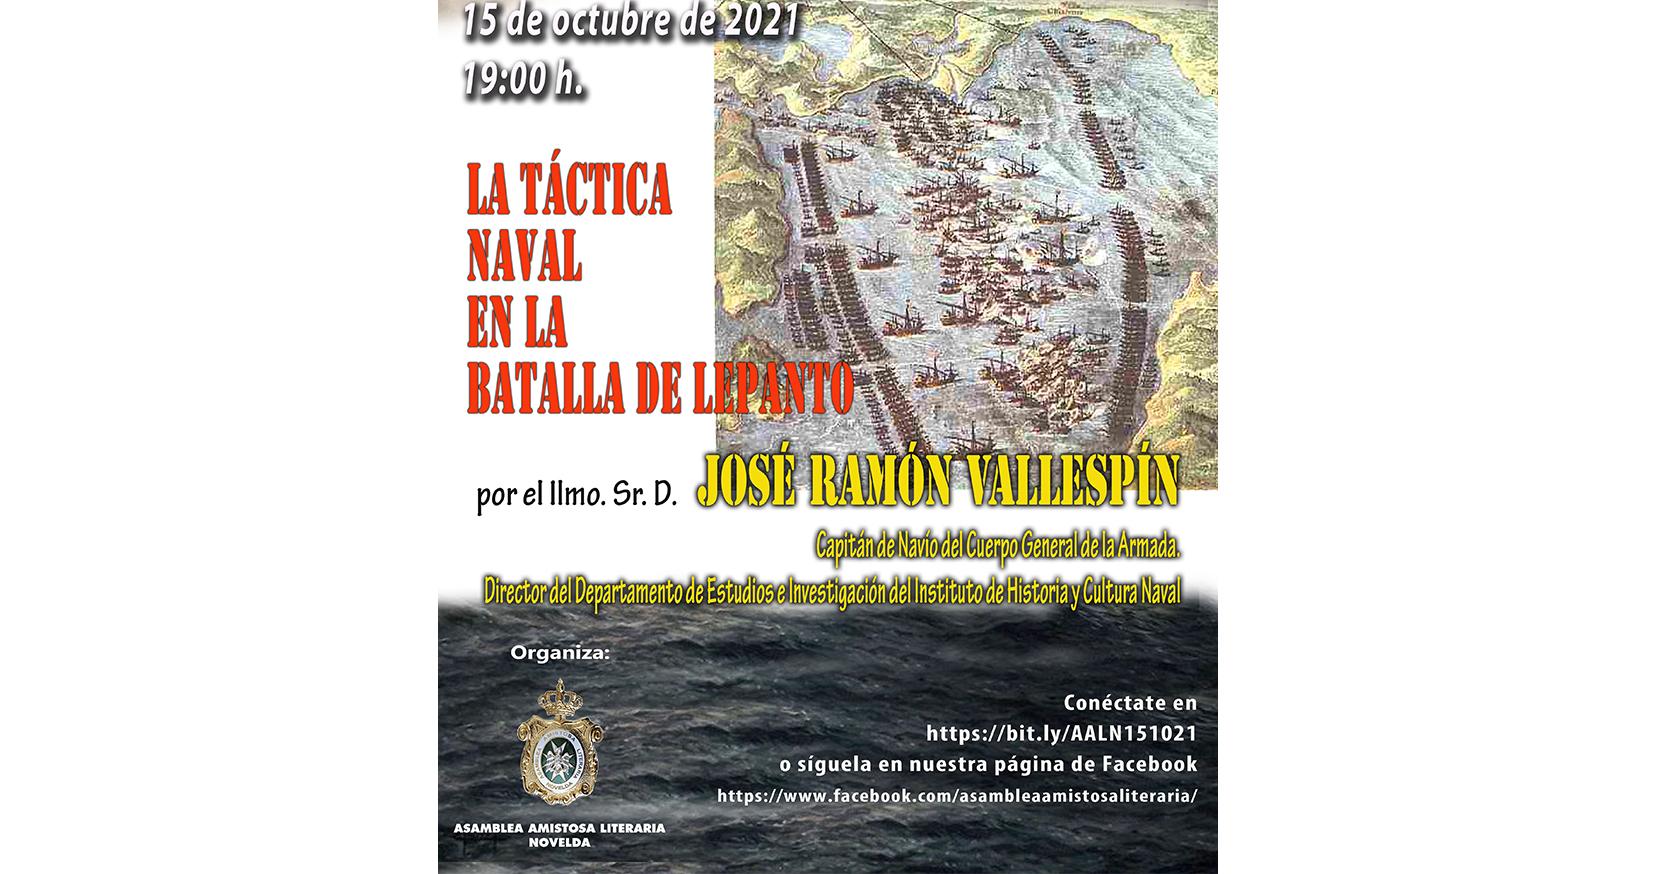 La Asamblea Amistosa Literaria de Novelda presenta mañana la videoconferencia La táctica naval en la Batalla de Lepanto